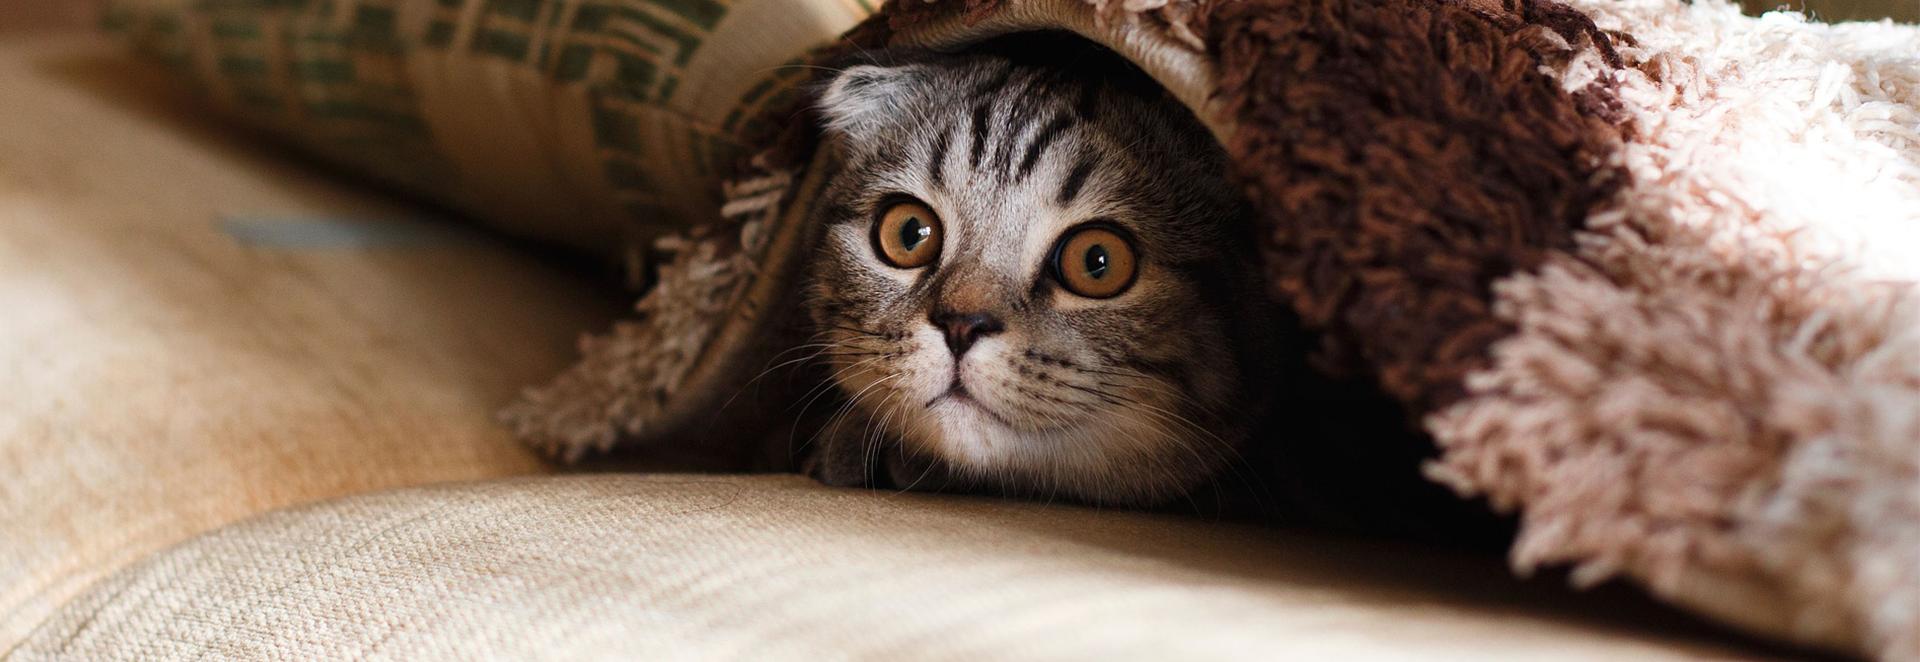 co oznacza mruczenie kota?